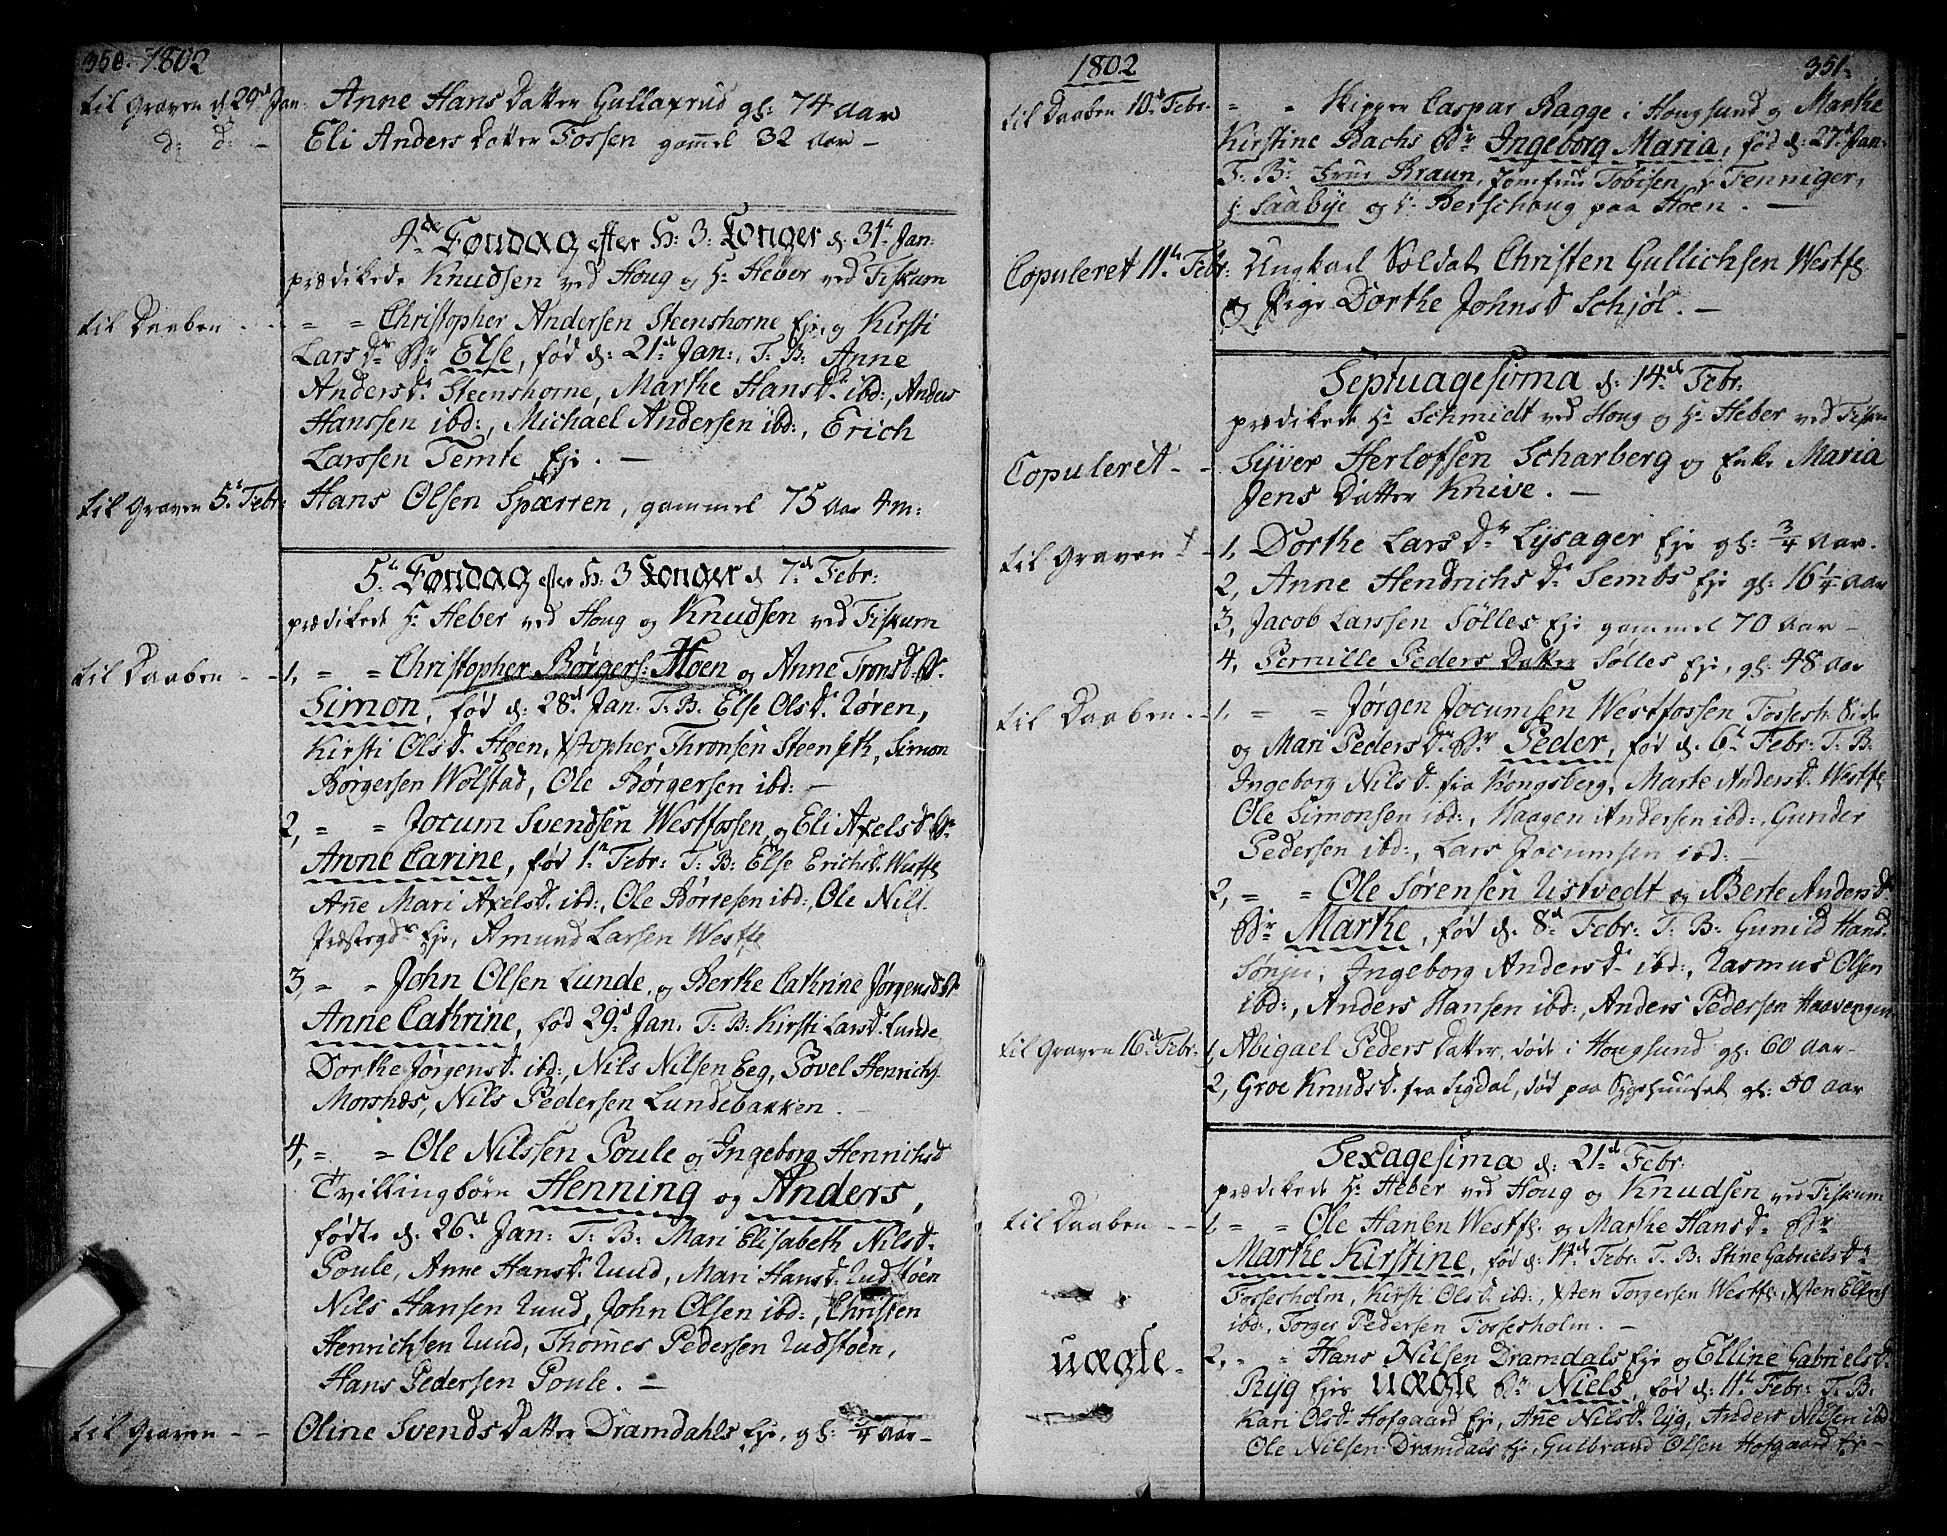 SAKO, Eiker kirkebøker, F/Fa/L0009: Ministerialbok nr. I 9, 1789-1806, s. 350-351